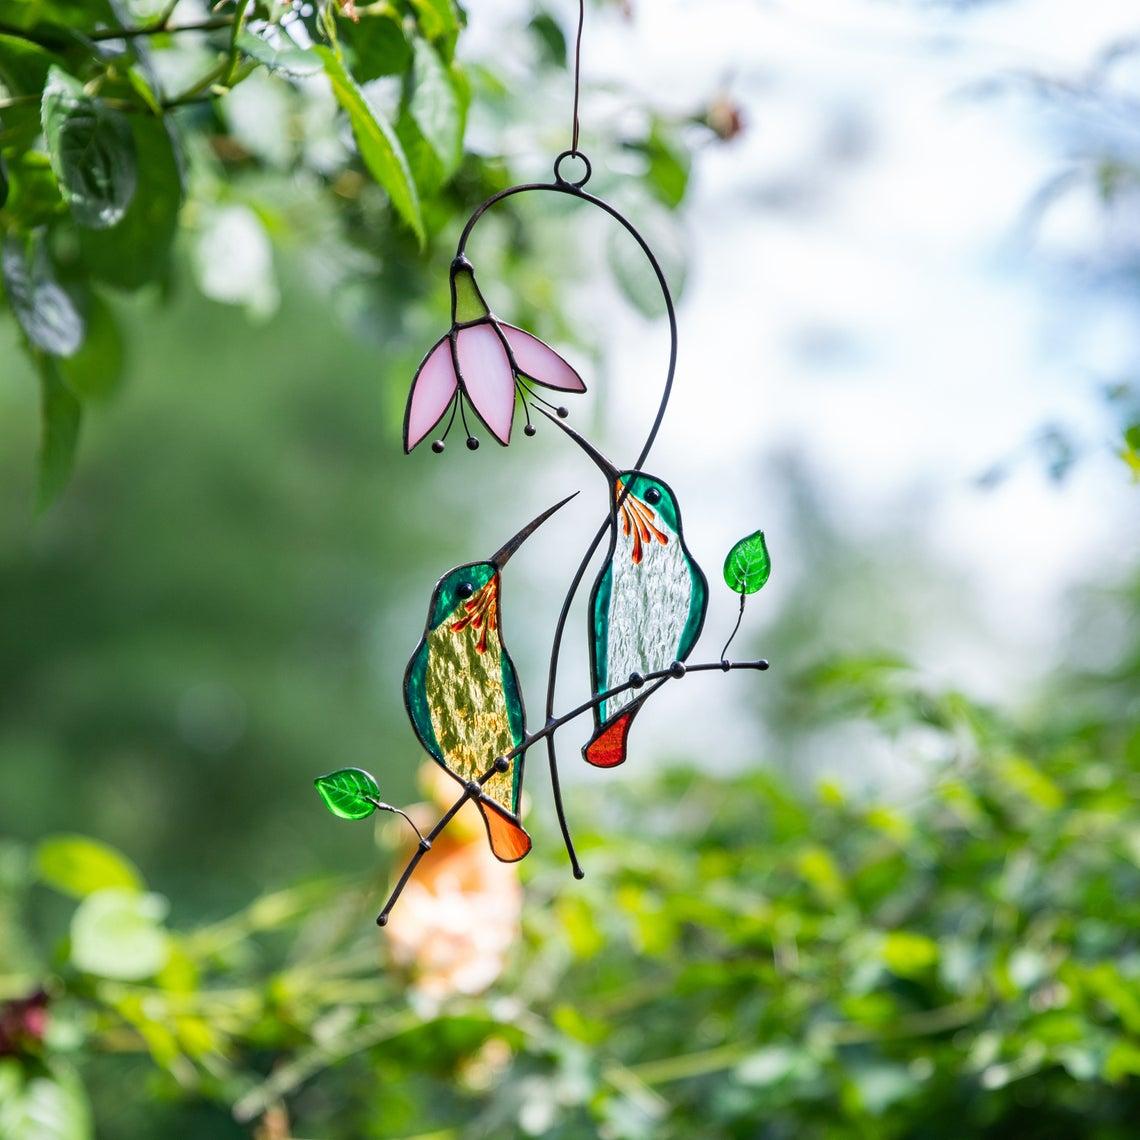 decor, garden, and hummingbird image